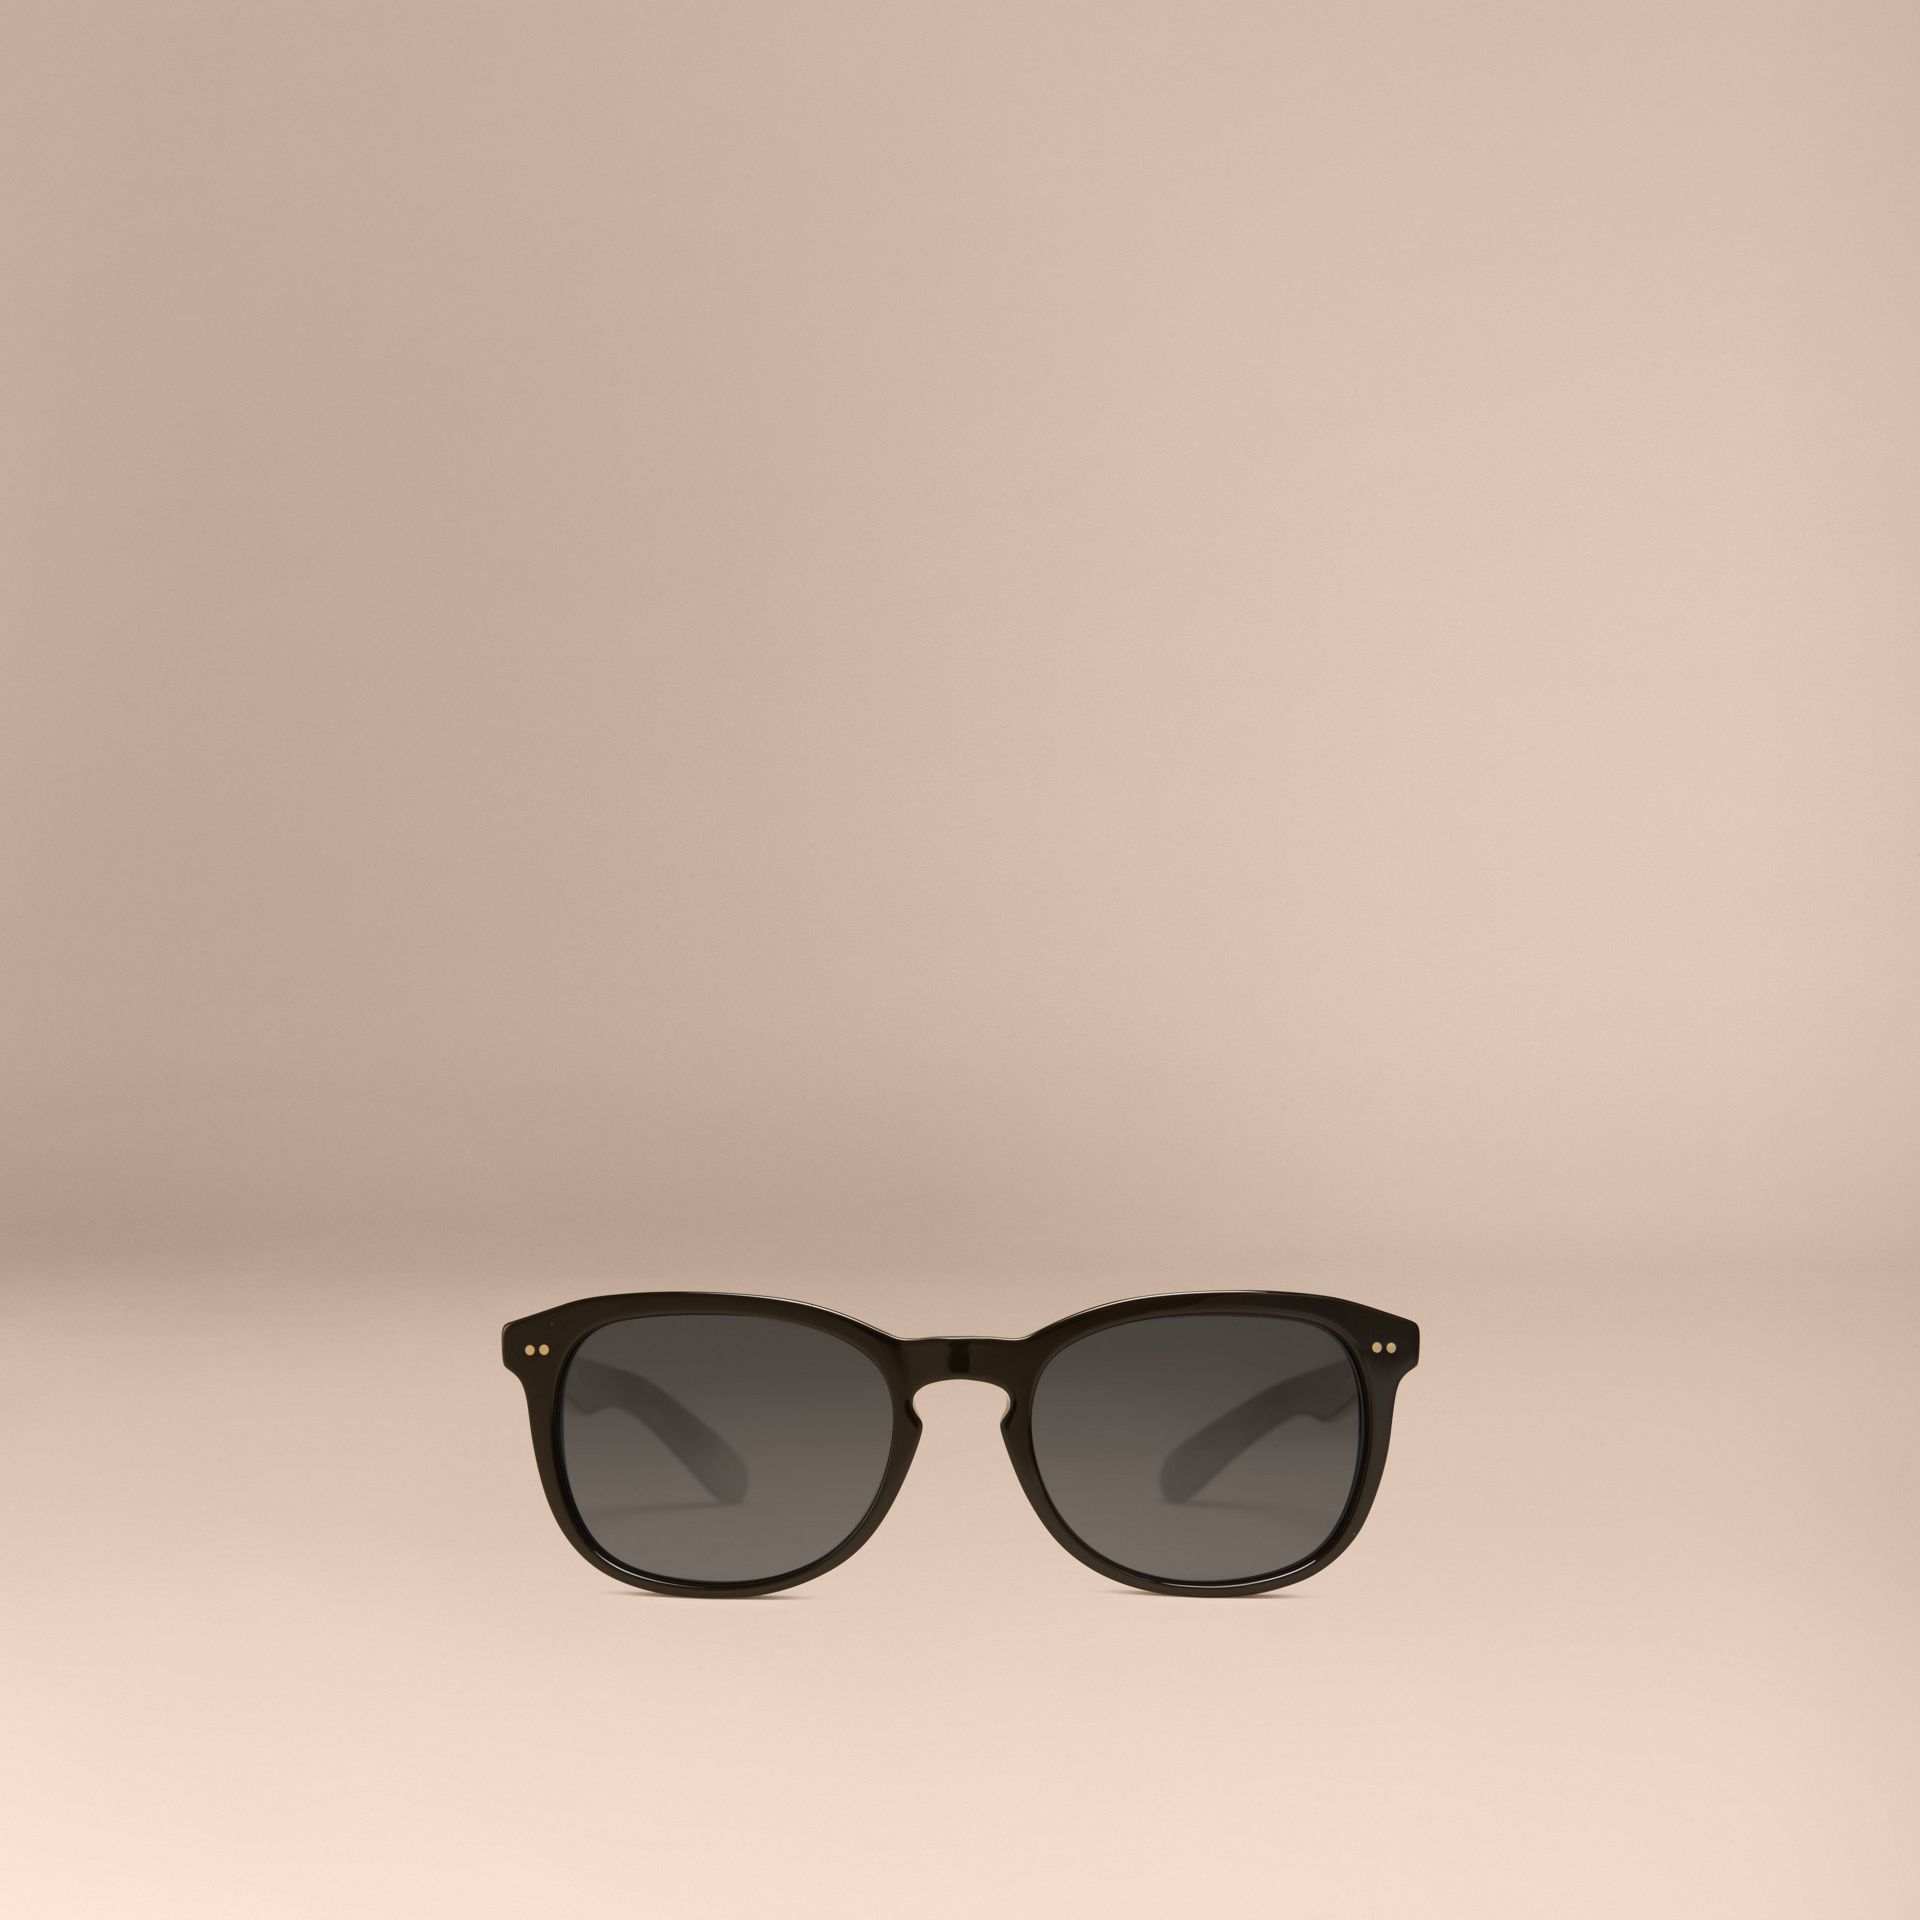 Black Square Frame Sunglasses Black - gallery image 3